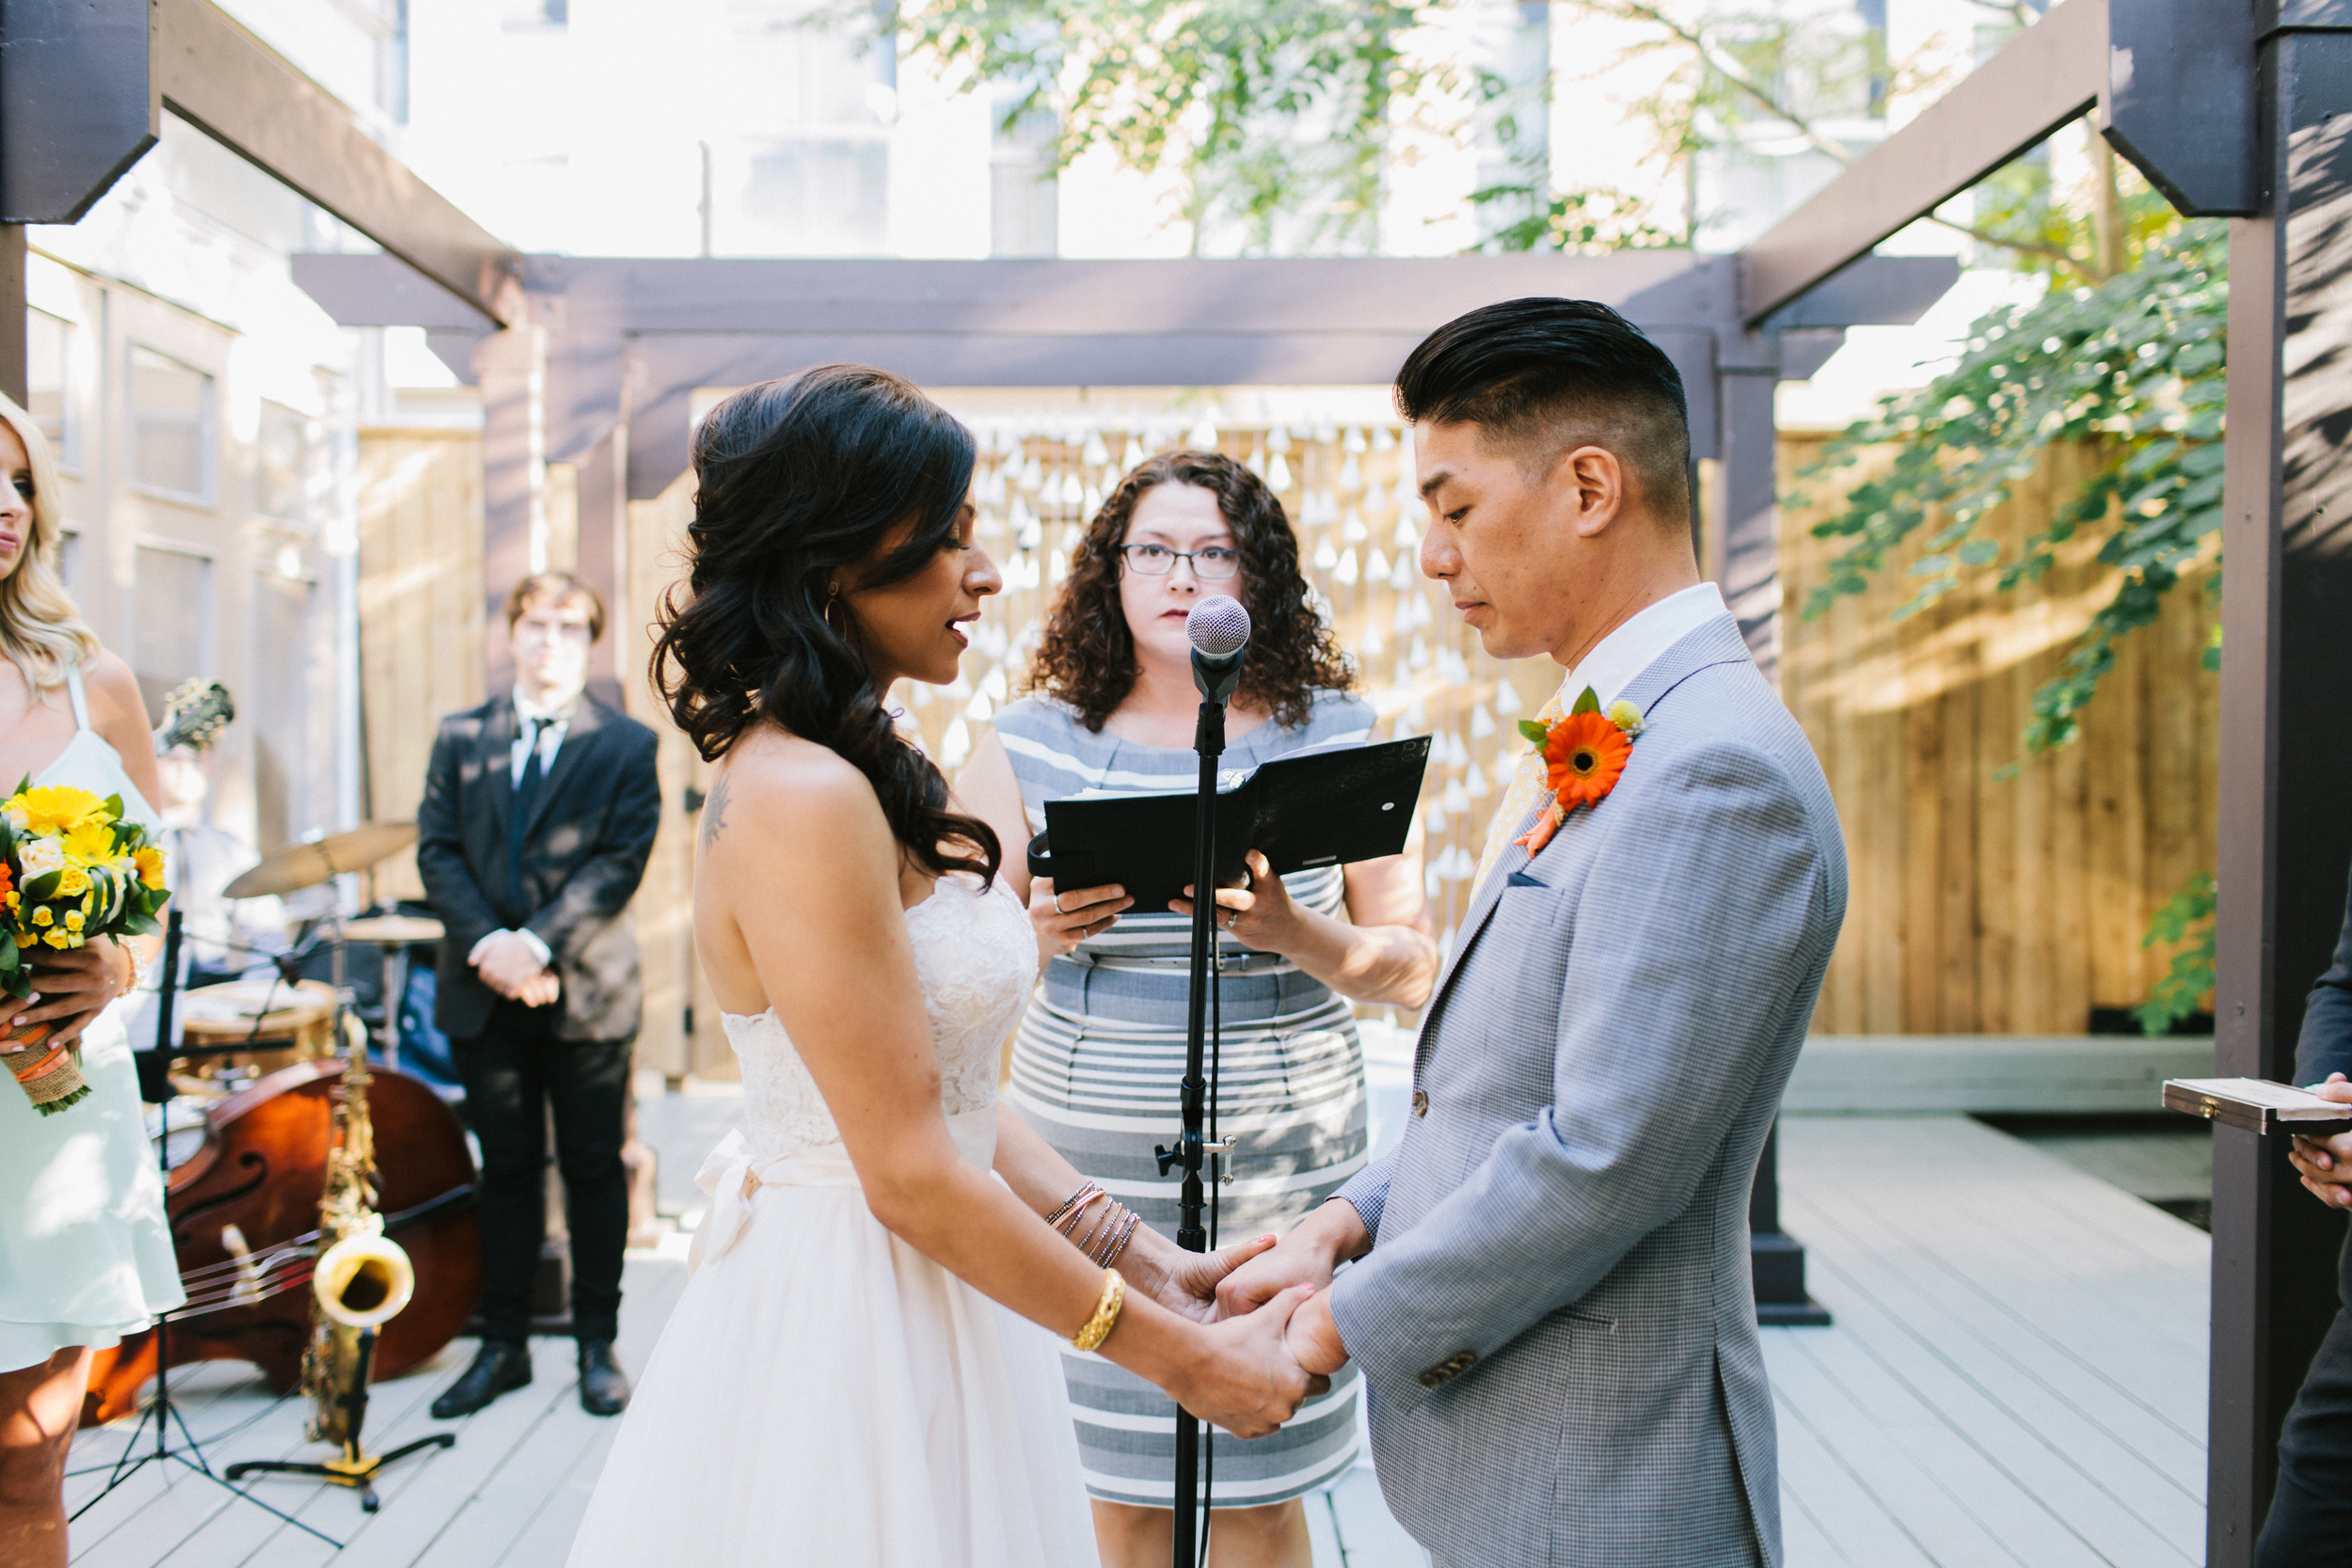 Berkeley-field-house-wedding-nicola-ken-064.jpg